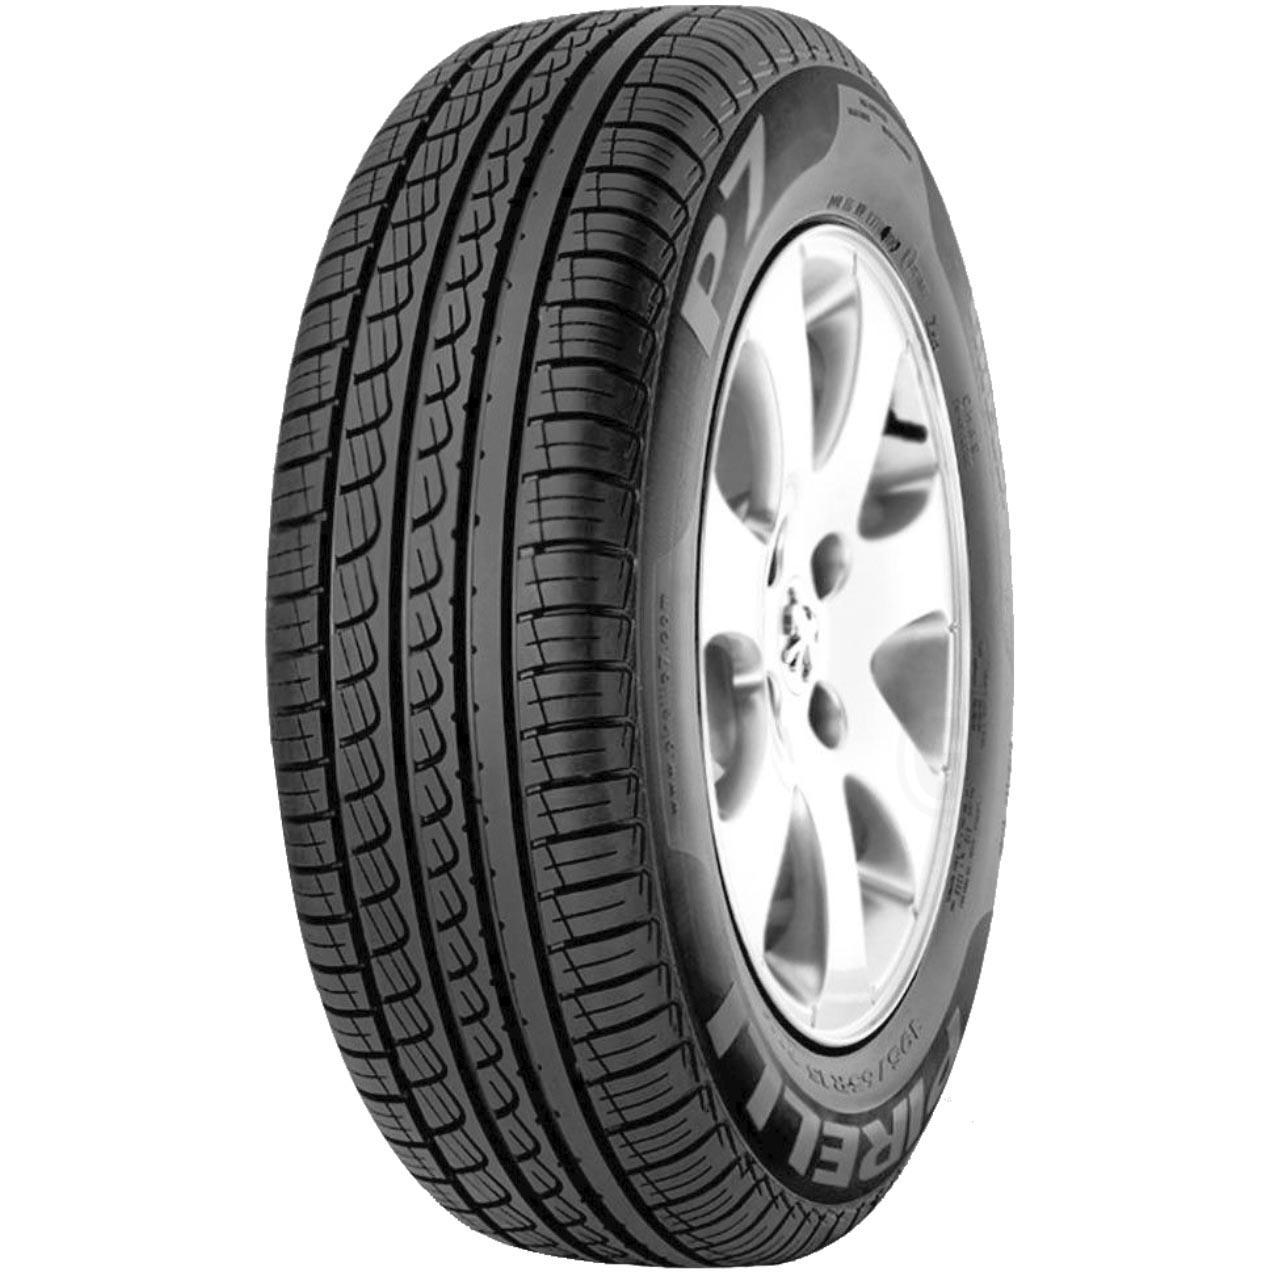 Pirelli P 7 205/55R16 91V (:)